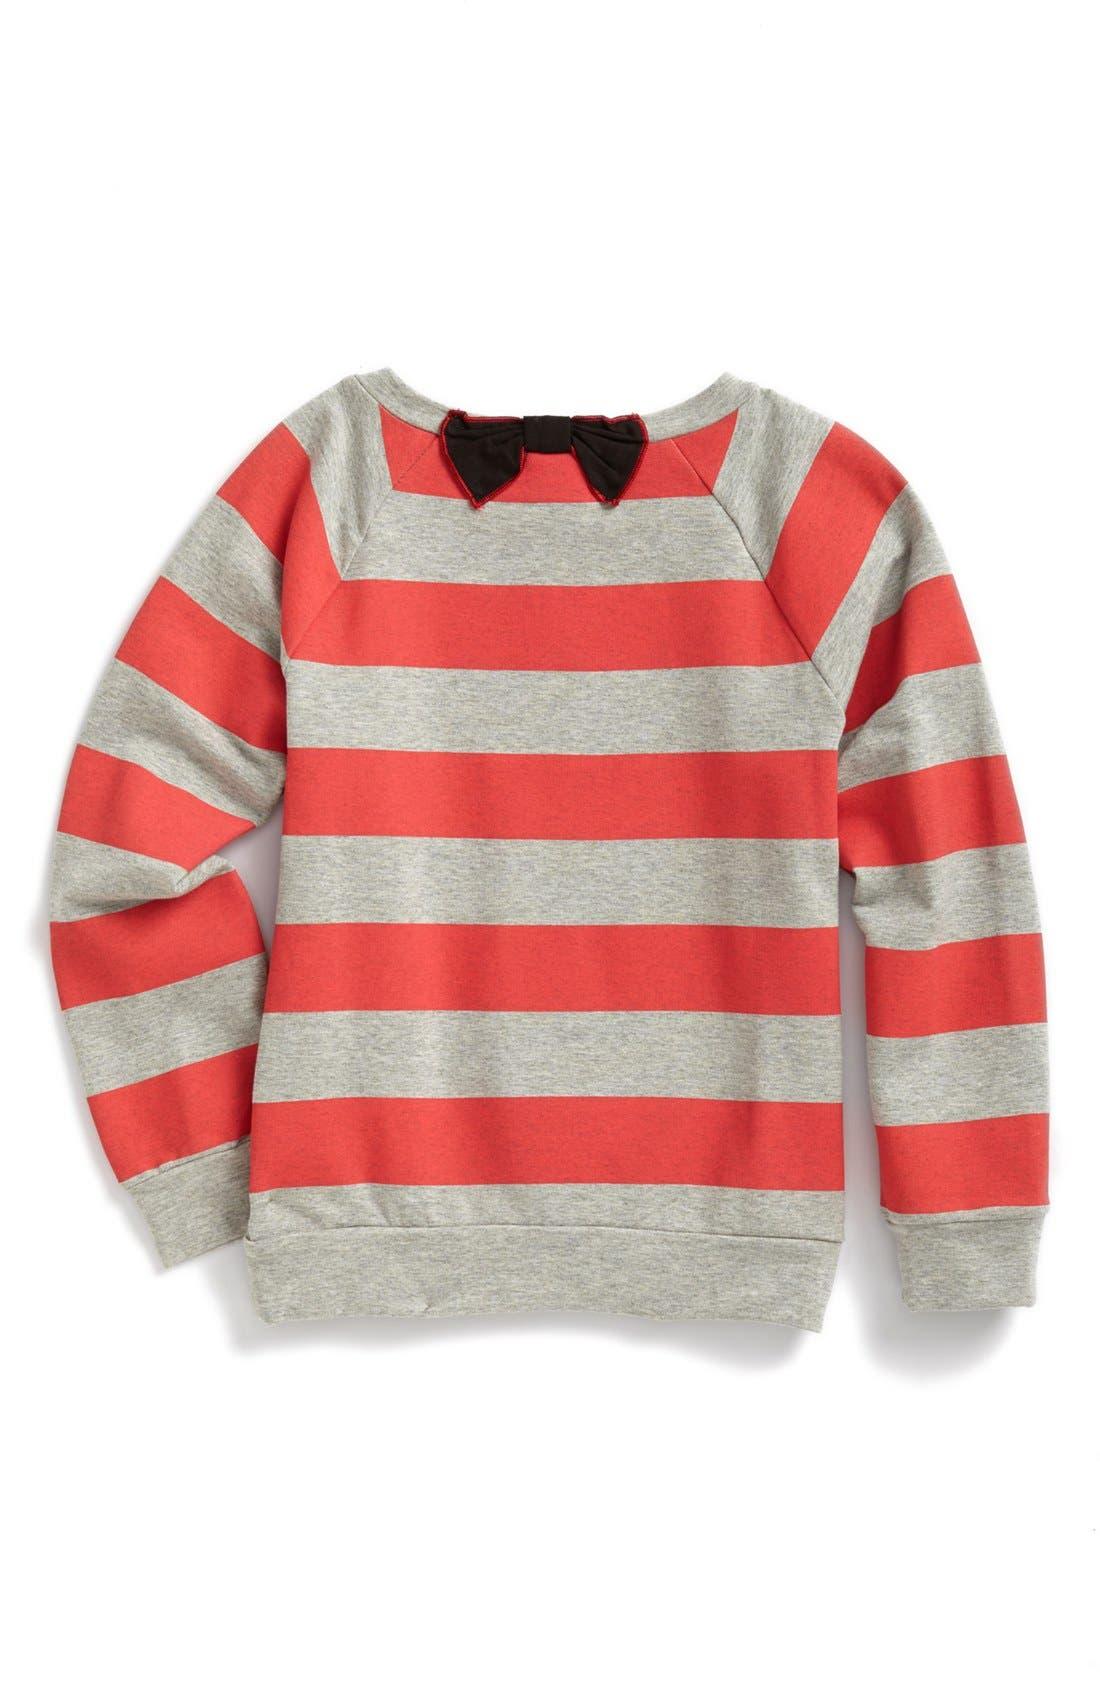 Alternate Image 2  - LITTLE MARC JACOBS 'Block Letter' Sweatshirt (Toddler Girls)